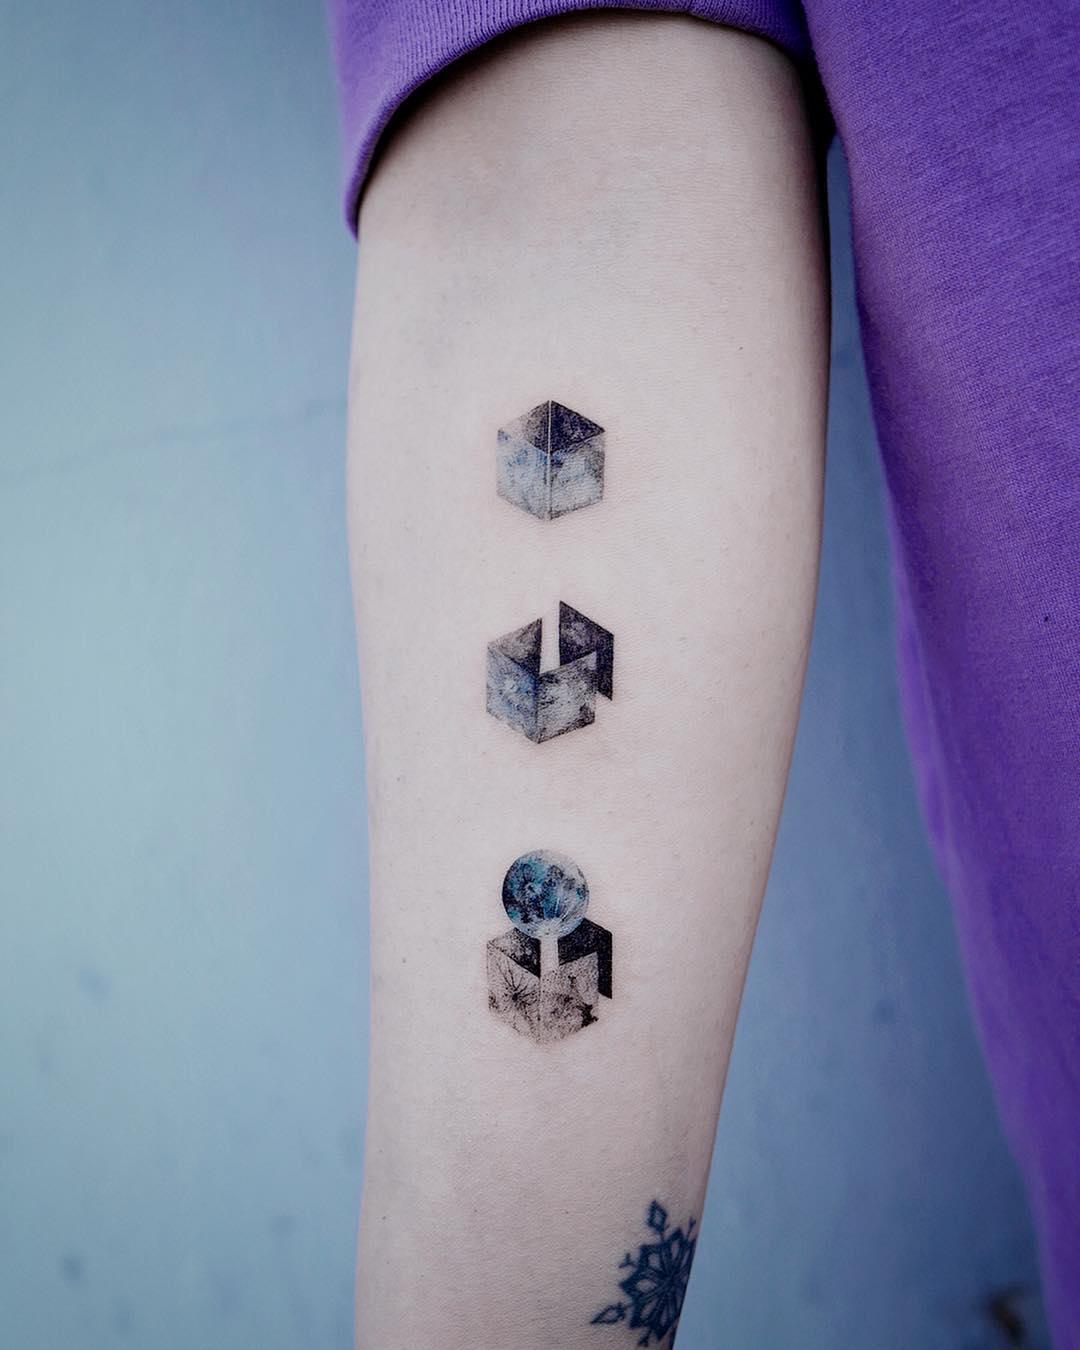 Moon cube tattoo by Studio Bysol